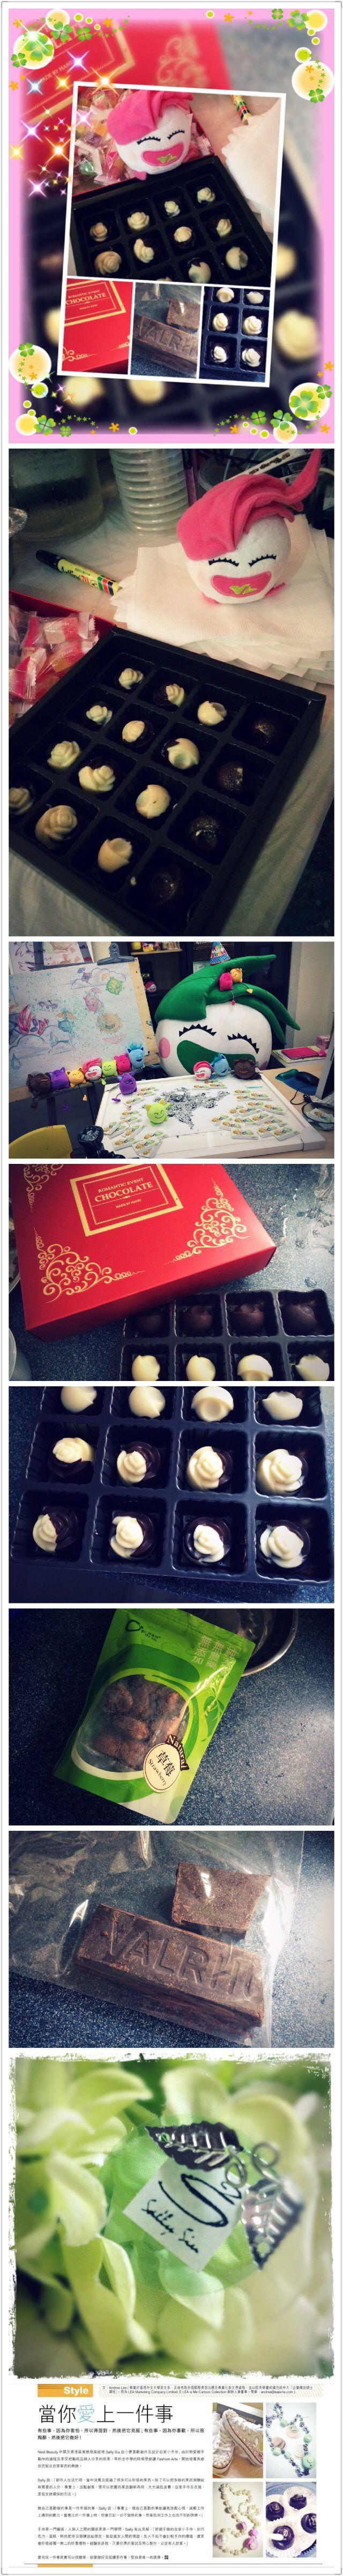 "Special handmade chocolates for my special dear ""lea 間工作室"" 2nd anniversary ^^ enjoy!!   Favours:  1. 100% dark chocolate w/ dry strawberry 2. Marble 35% milk x 100% dark   品嚐區 Fanpage: https://m.facebook.com/SAlleeesiu/?  分享 link: http://siusally.blogspot.hk/2014/08/salleeechocolate-strawberry-dark-white.html?m=1  莎莉。品味儷人將手做作品巳全數捐贈 U heart「兩地一心管理下的 Lea is Me愛德教育基金協助提升祖國教育及社會上有需要的社群。」  Charity 分享link: http://siusally.blogspot.hk/2014/04/salleeecharity-u-heart-n-lea-is-me.html?m=1"